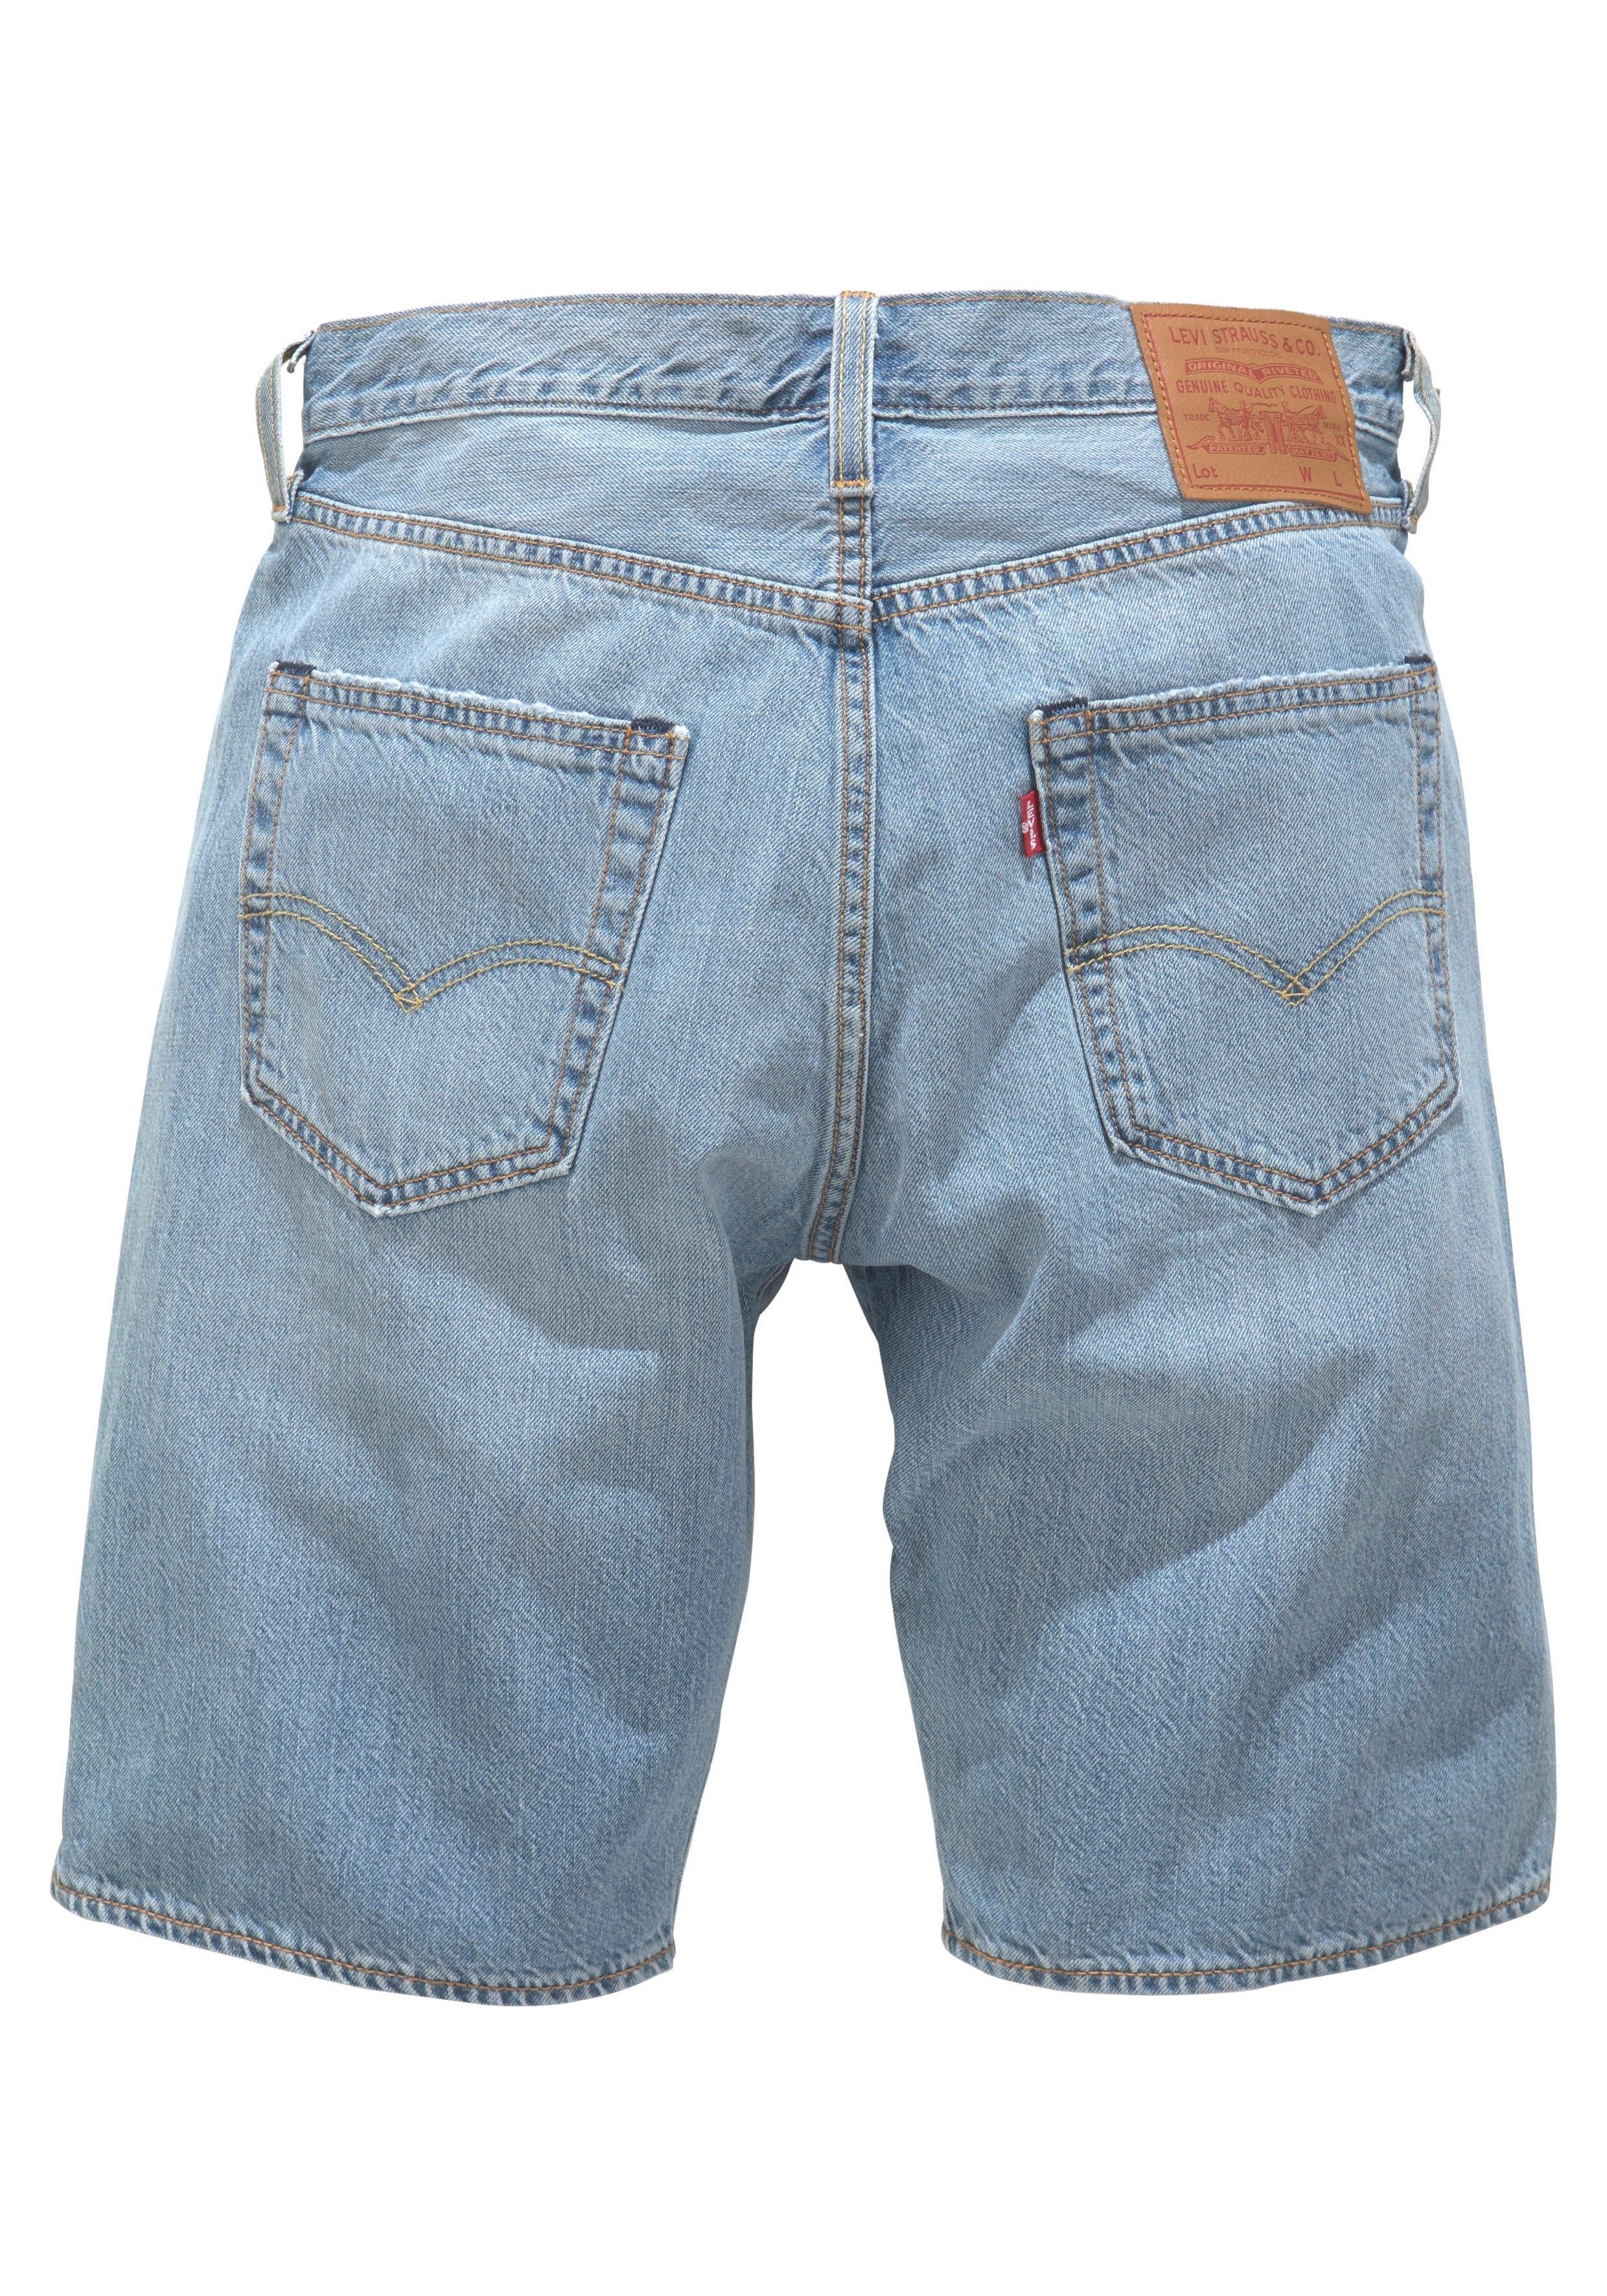 Winkel In De Levi's® Jeansshort Online rCdxBeoW